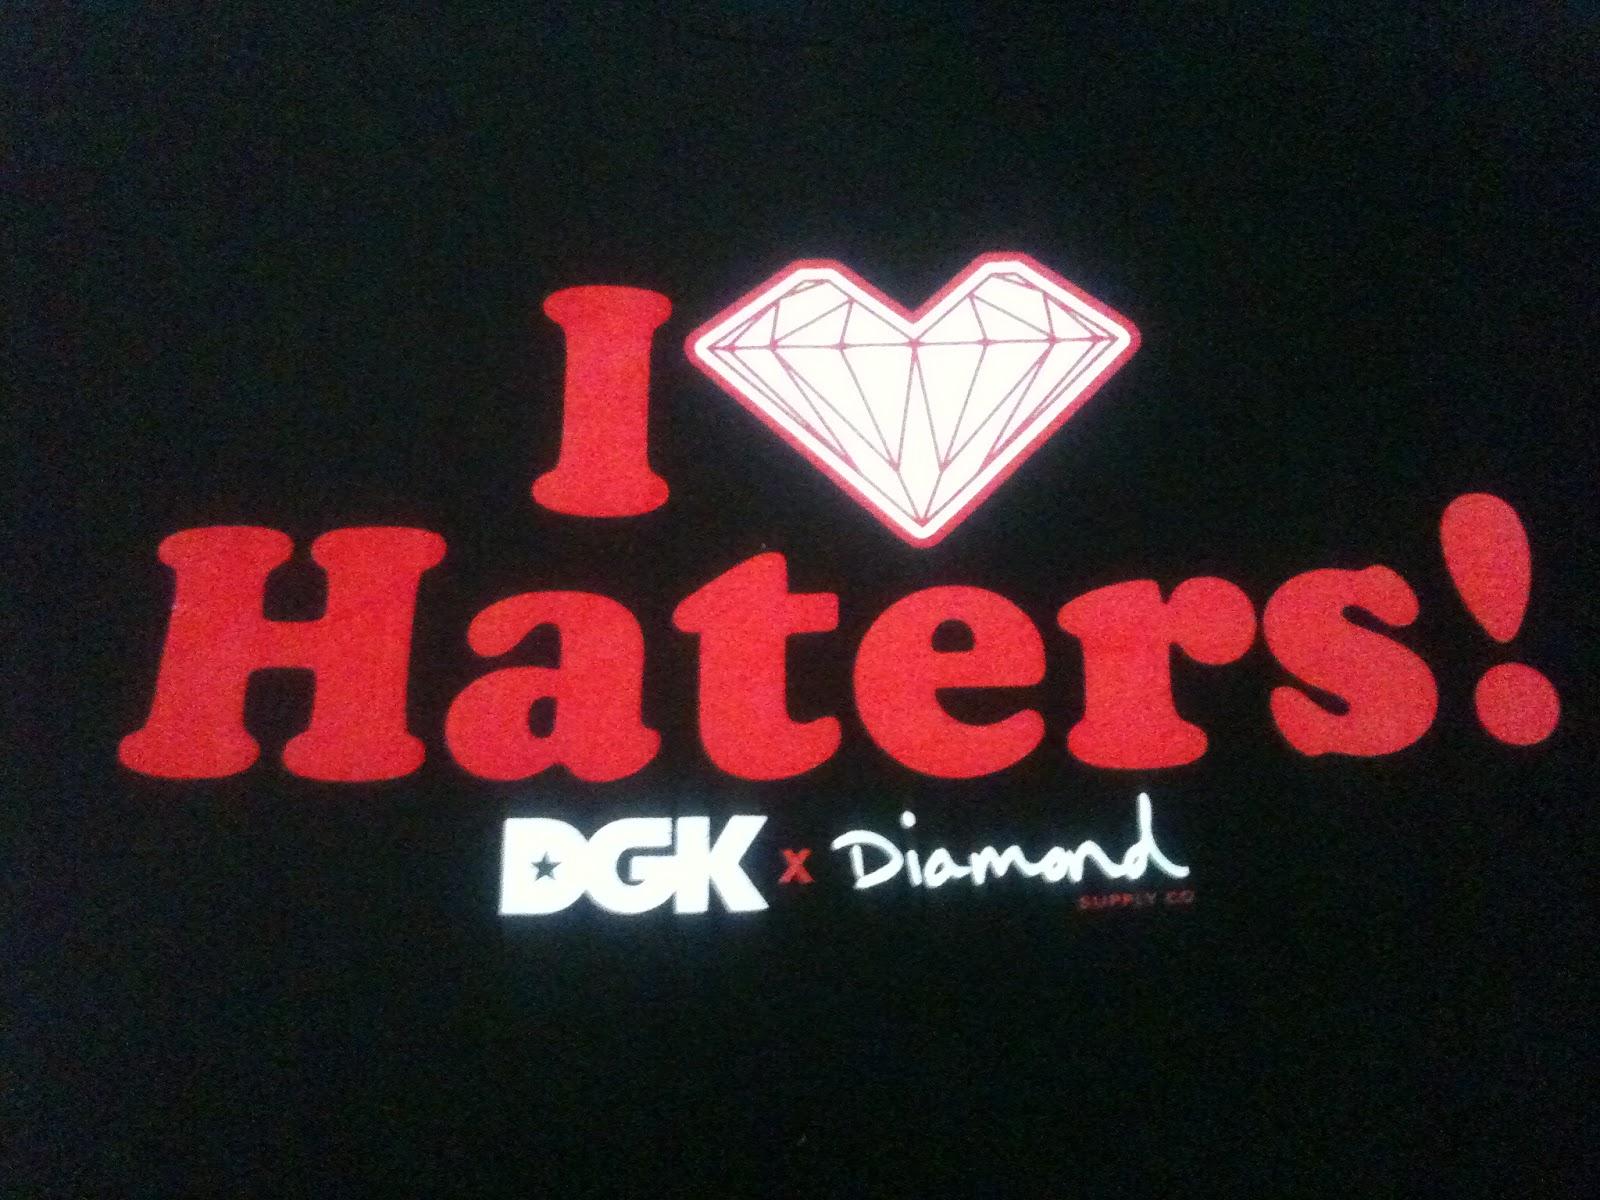 Dgk Wallpaper I Love Haters Dgk wallpaper i love haters 1600x1200